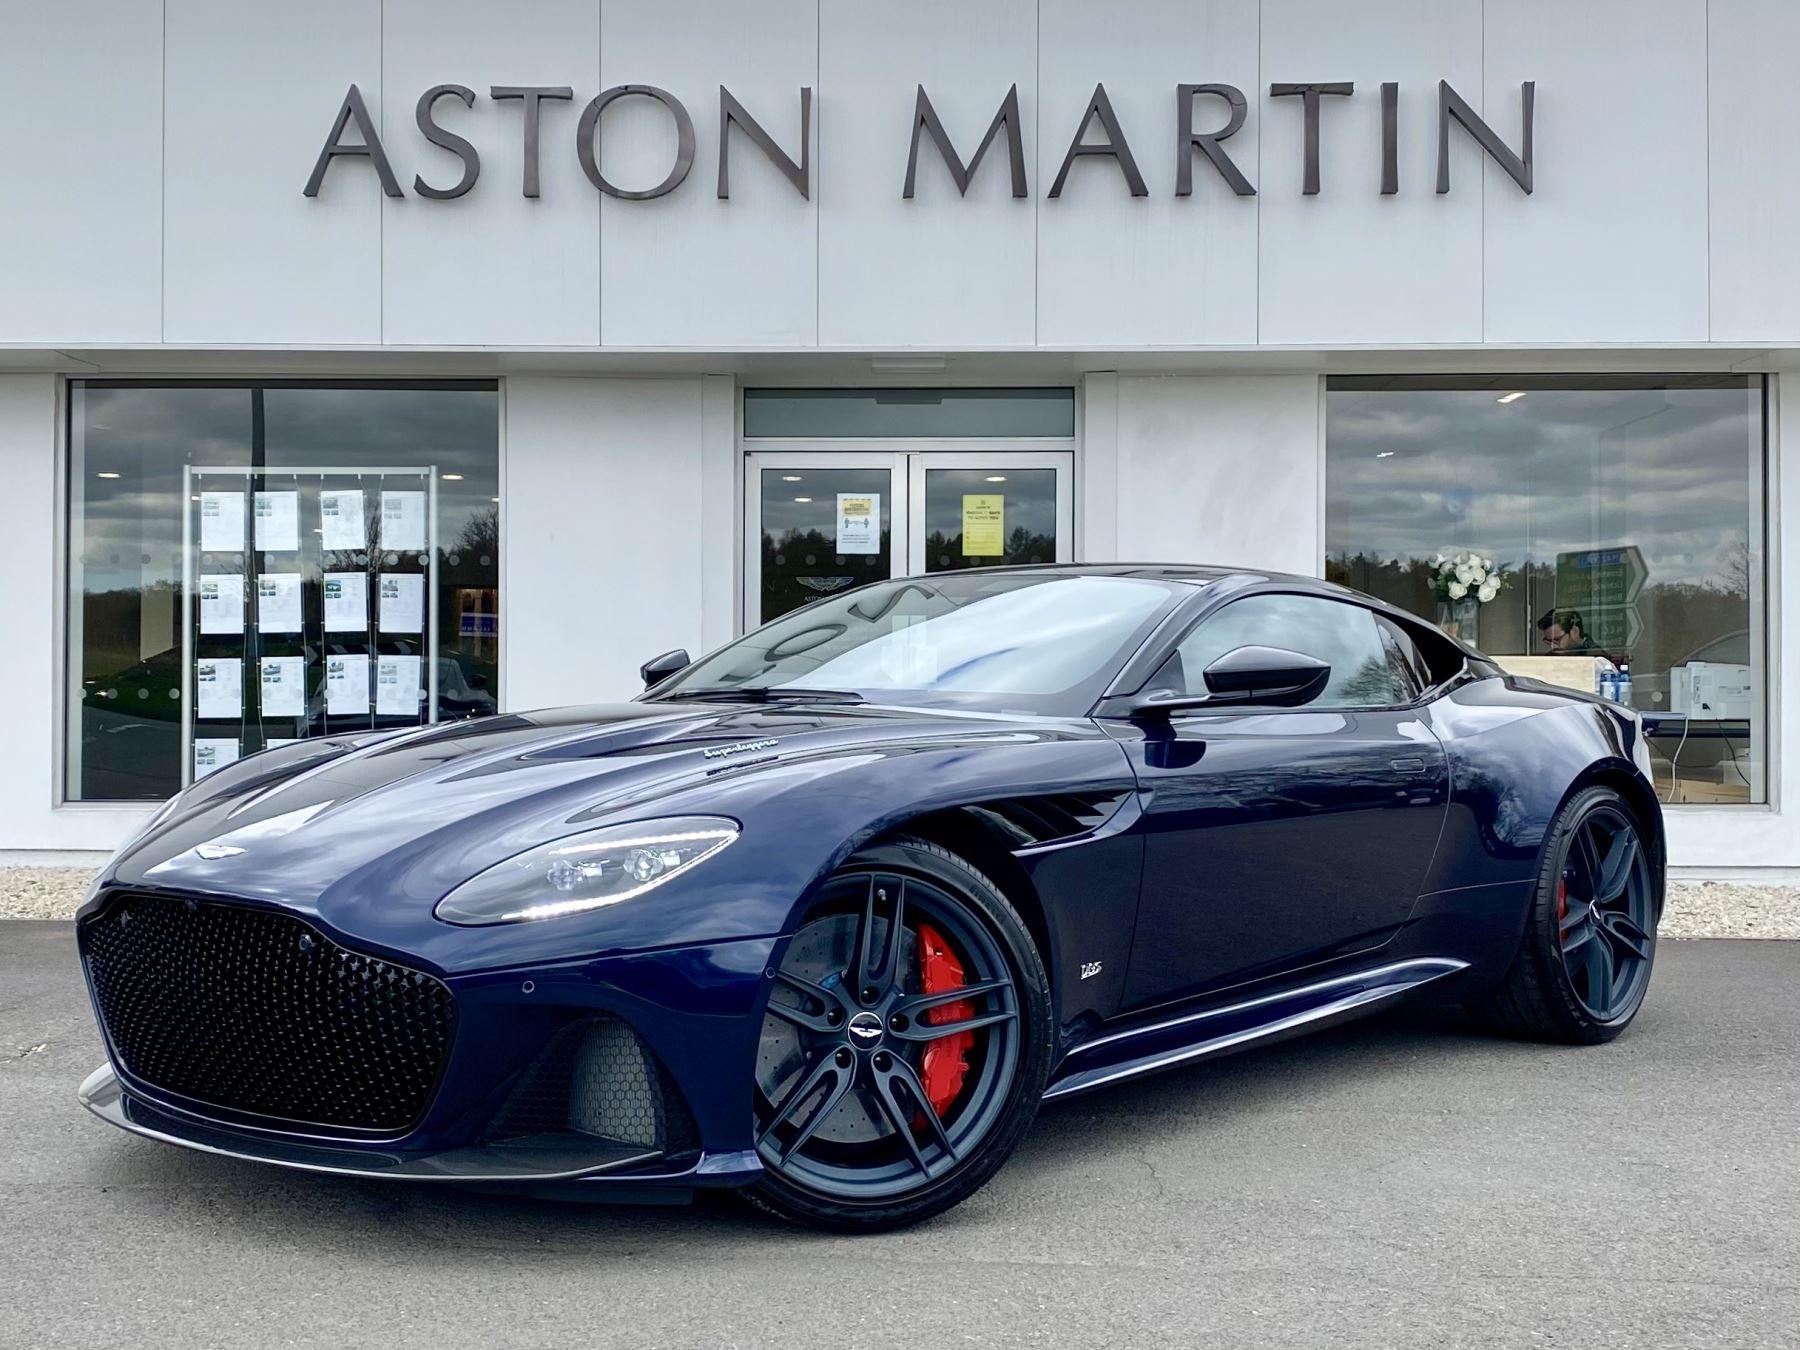 Aston Martin DBS Superleggera V12 Superleggera 2dr Touchtronic Auto 5.2 Automatic 3 door Coupe (2020) image